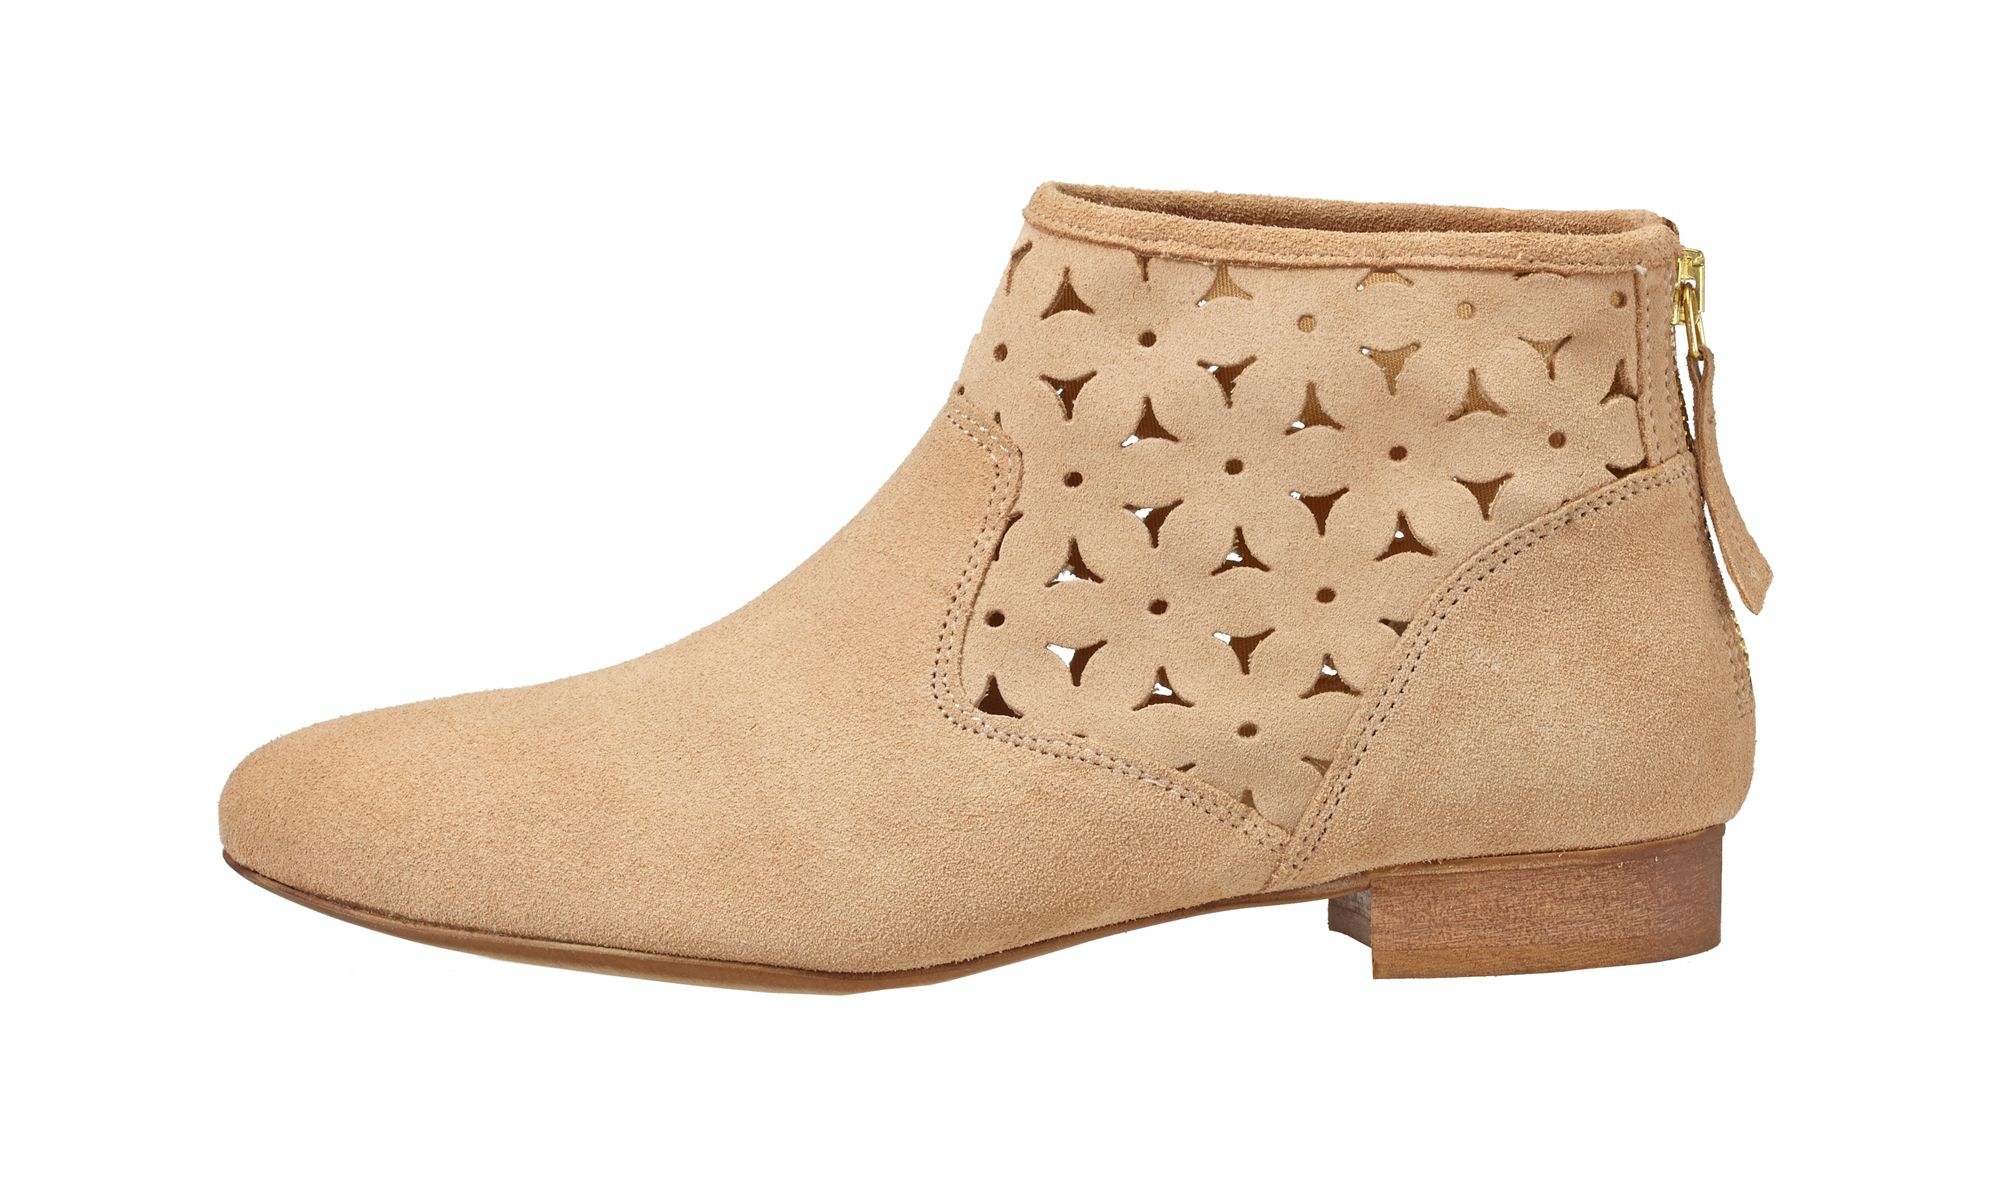 Humanic Damenschuhe I Trend In Bloom #DesignerOutletParndorf